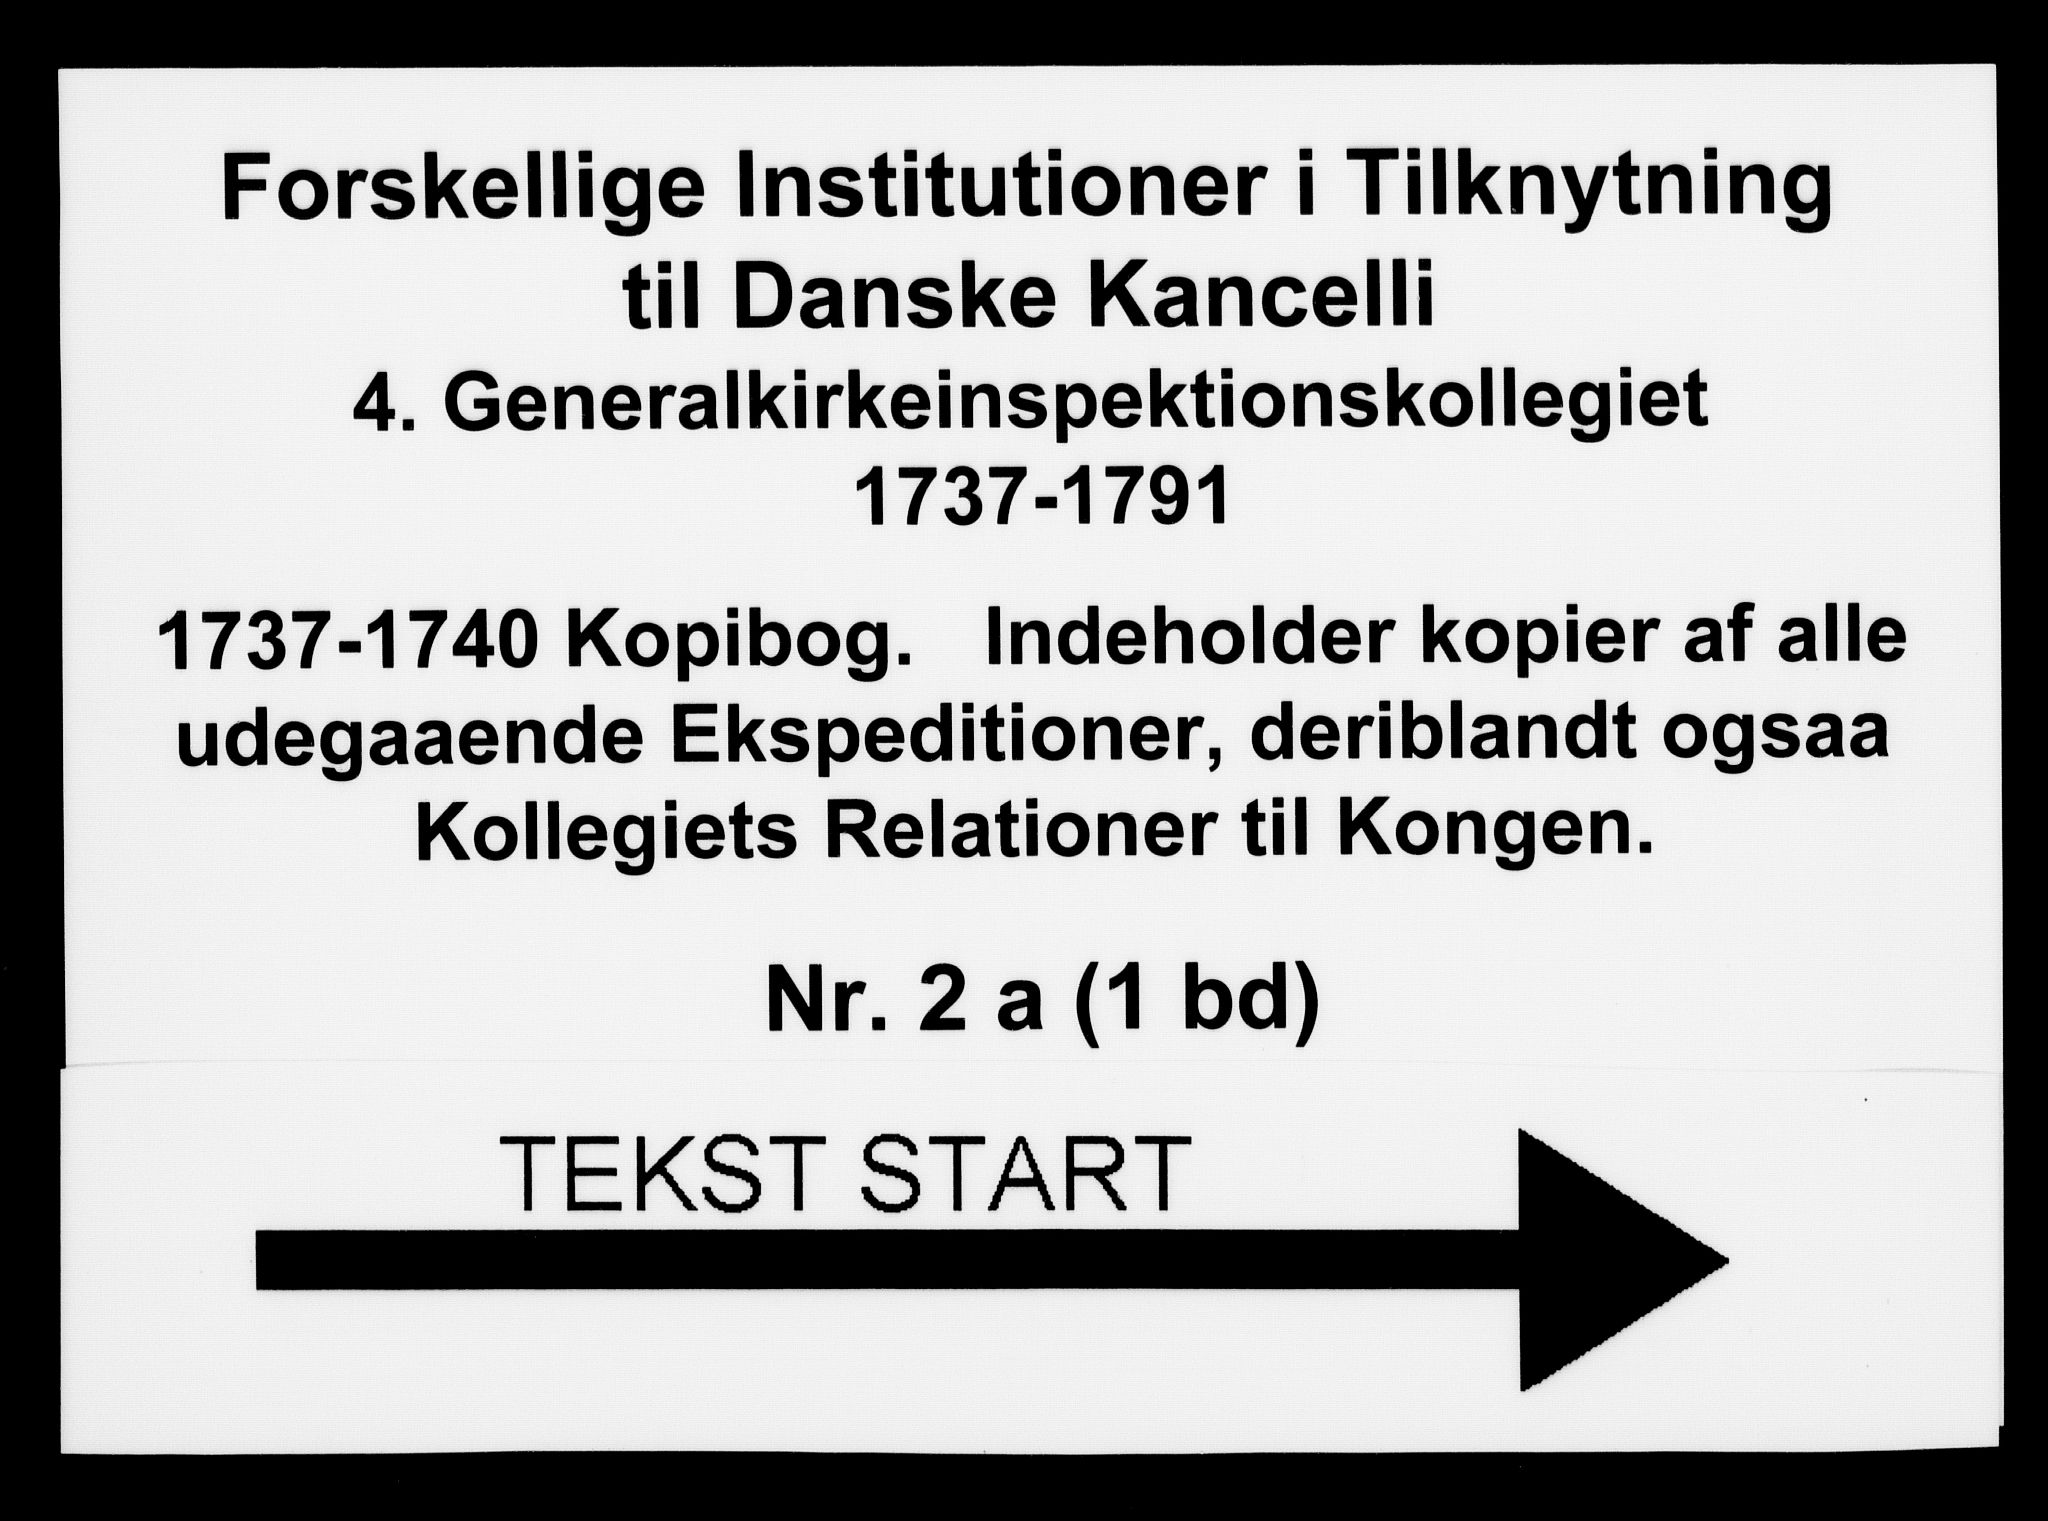 DRA, Generalkirkeinspektionskollegiet, F4-02/F4-02-01: Kopibog, 1737-1740